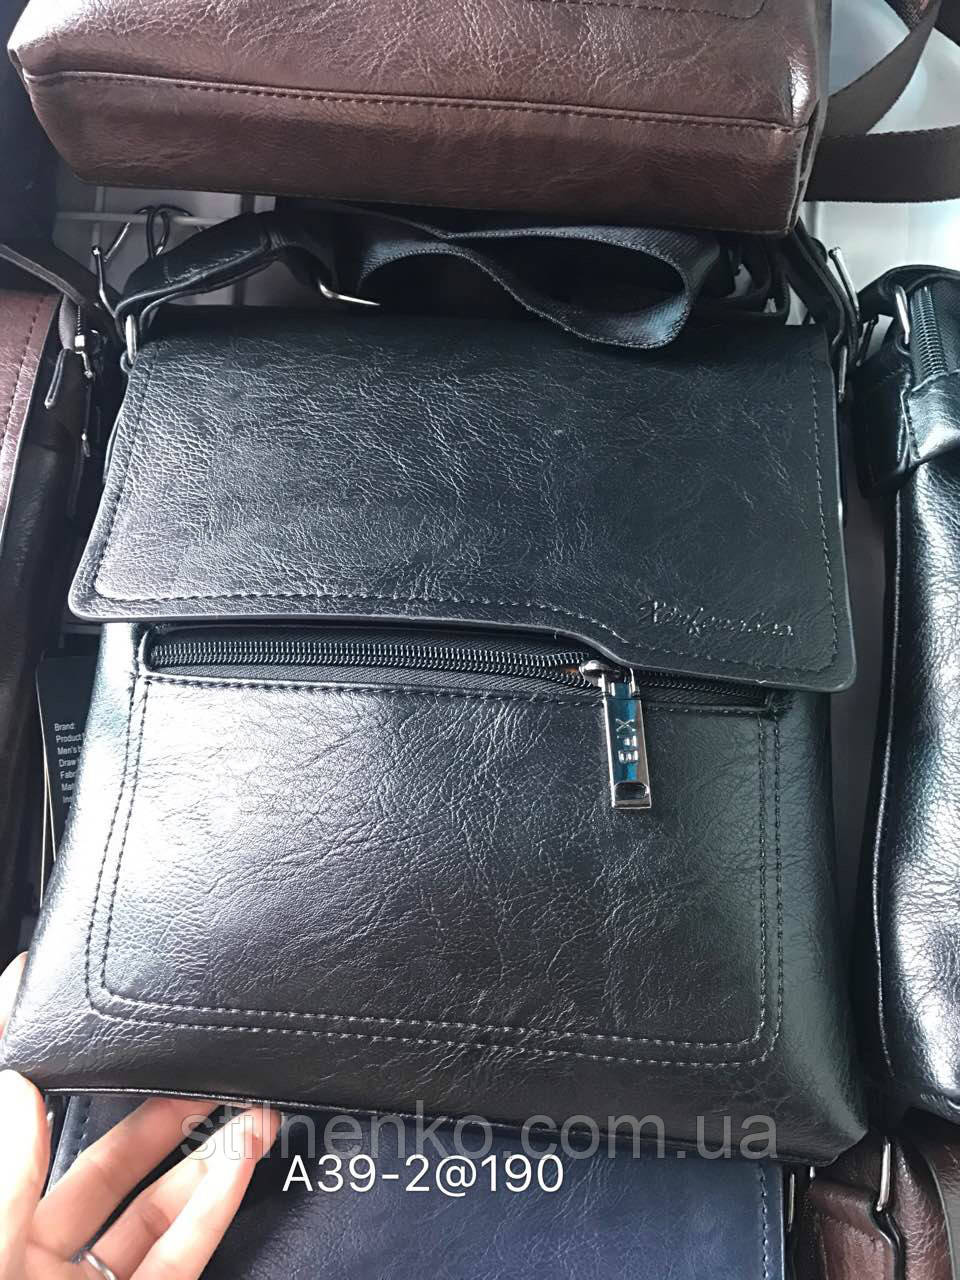 Чоловіча сумка